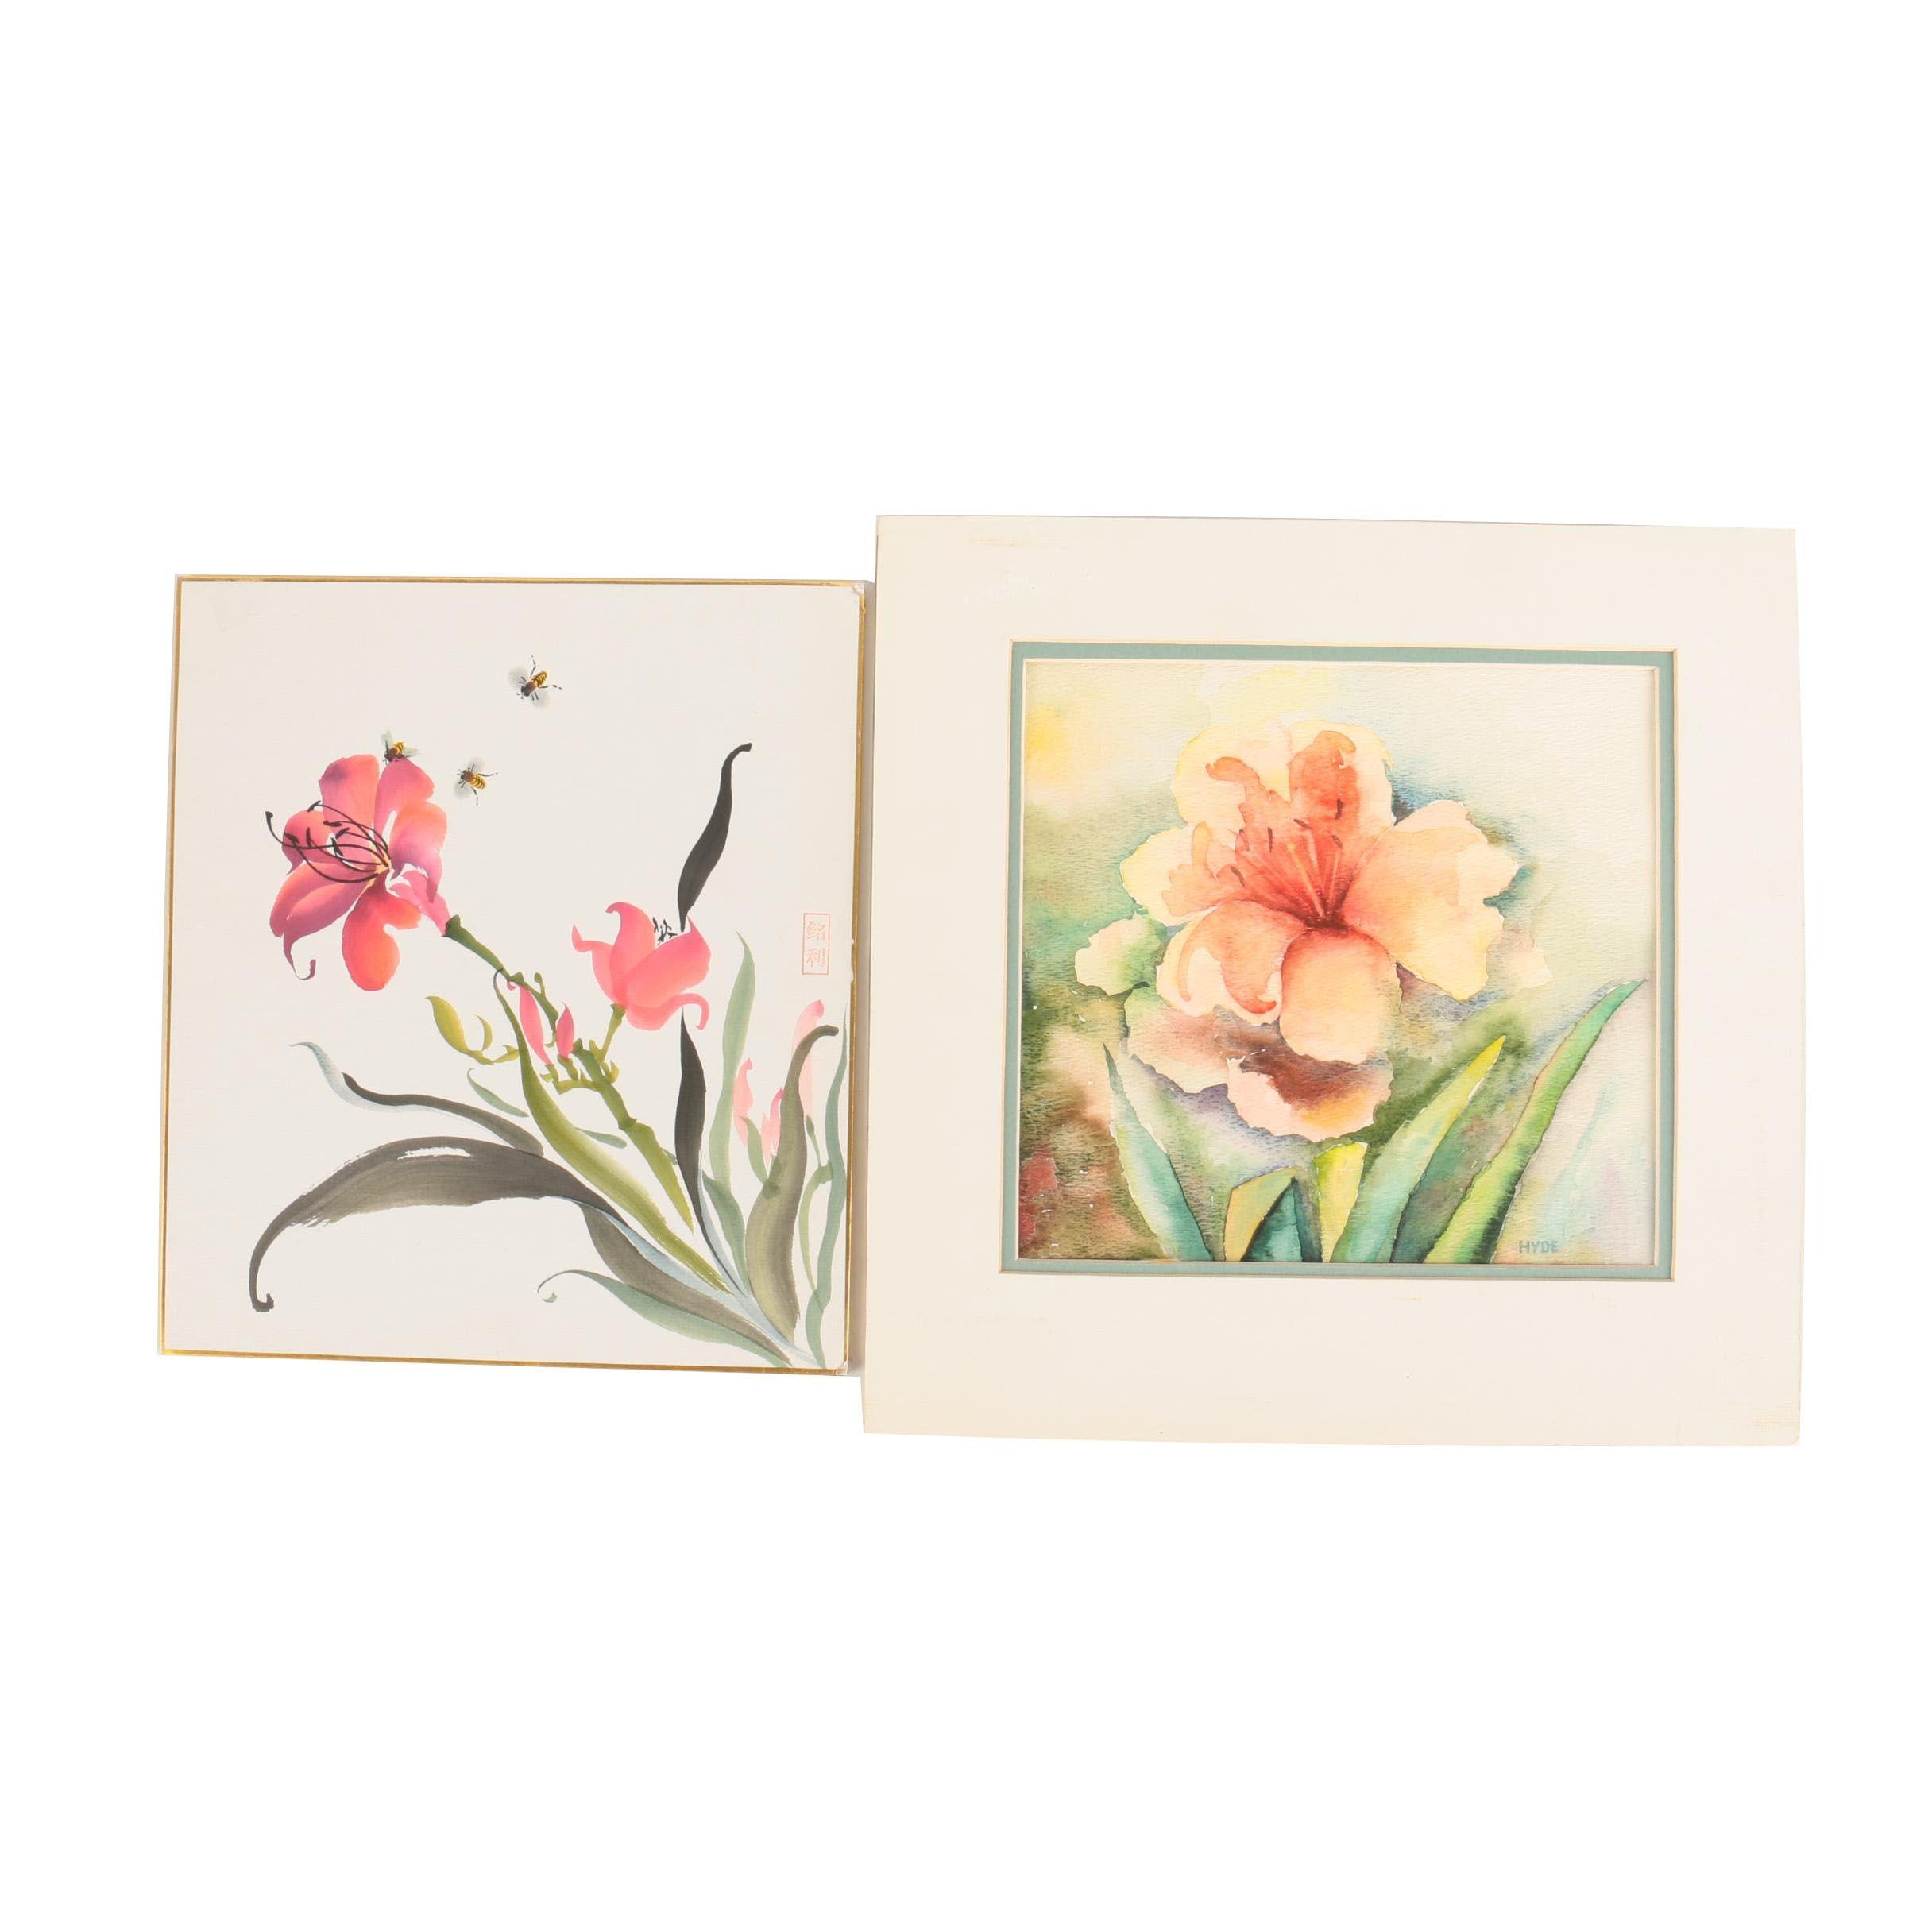 Watercolor Paintings on Paper of Flowers